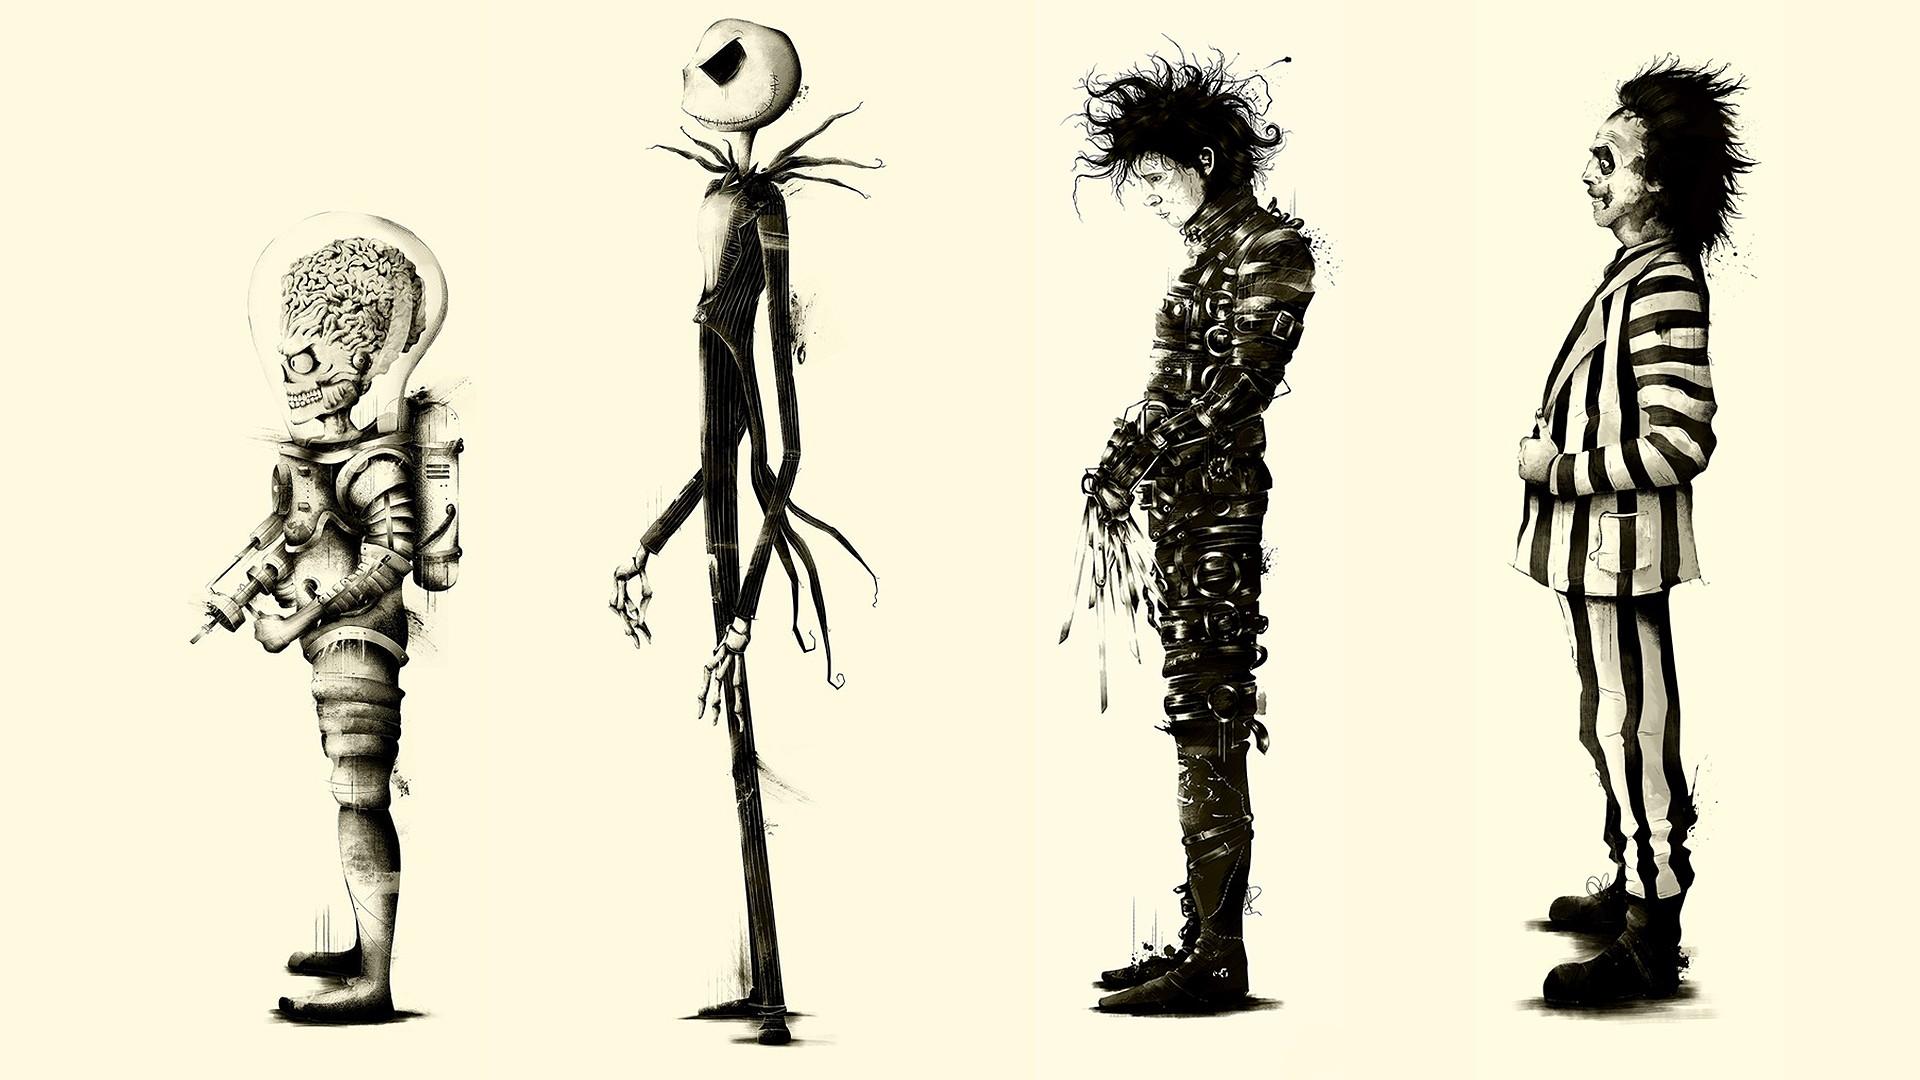 fond d 39 cran illustration monochrome films dessin anim fan art squelette edward. Black Bedroom Furniture Sets. Home Design Ideas